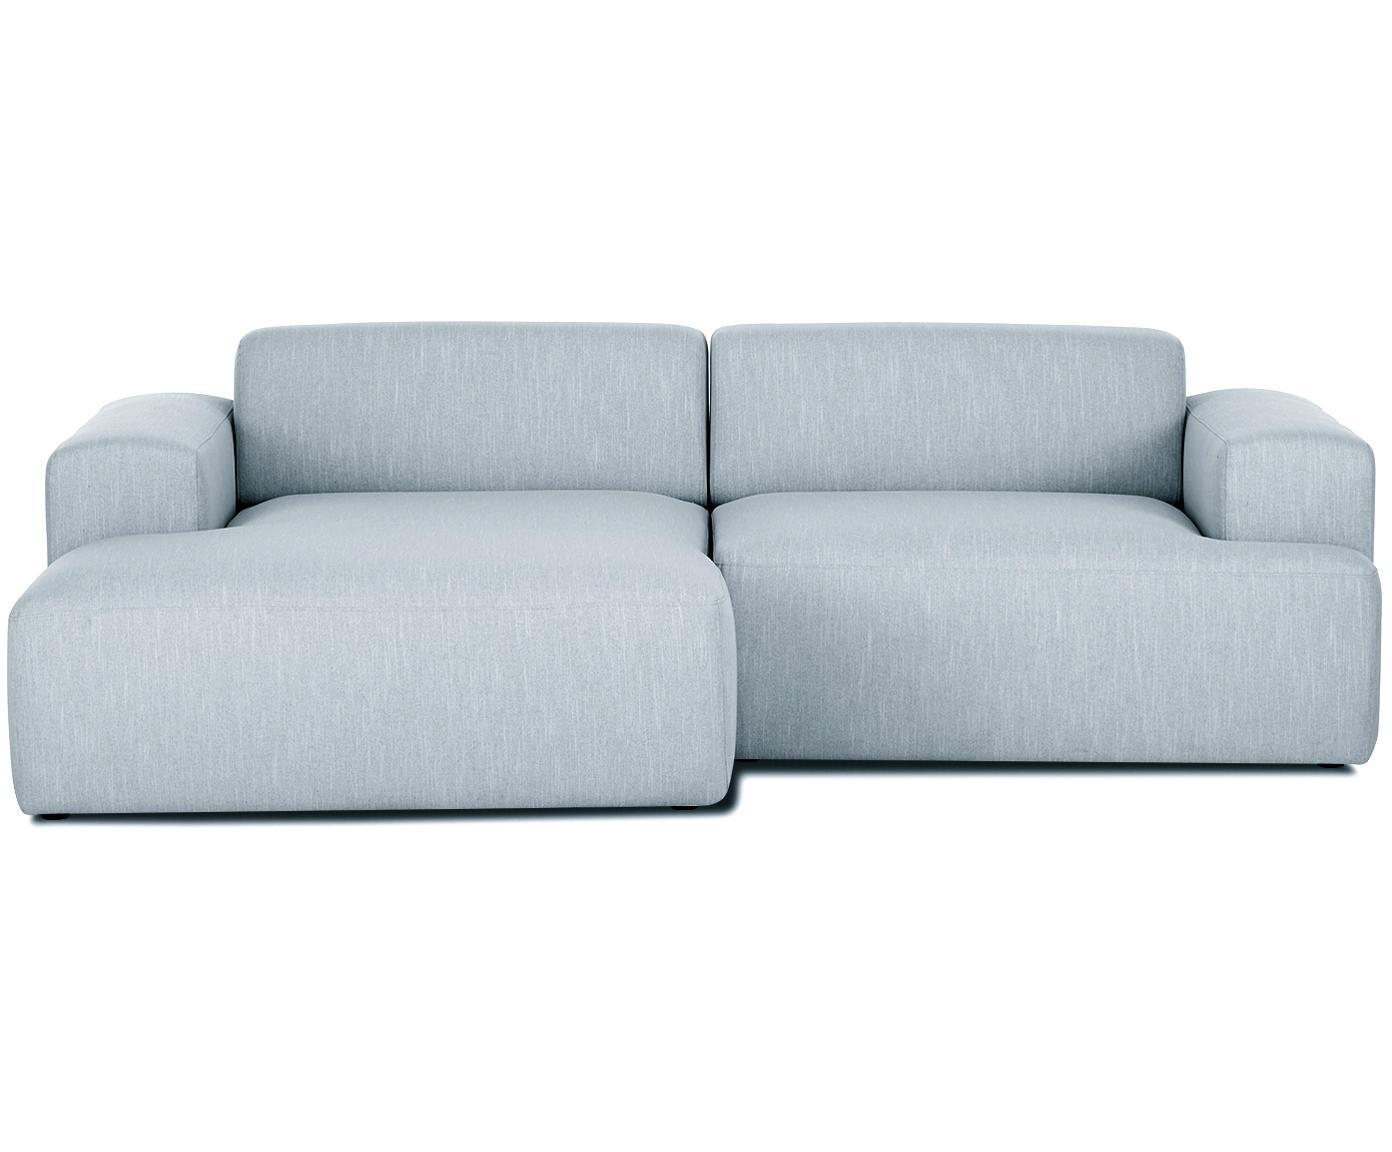 Ecksofa Melva (3-Sitzer), Bezug: Polyester 35.000 Scheuert, Gestell: Massives Kiefernholz, Spa, Füße: Kiefernholz, Webstoff Blaugrau, B 240 x T 144 cm